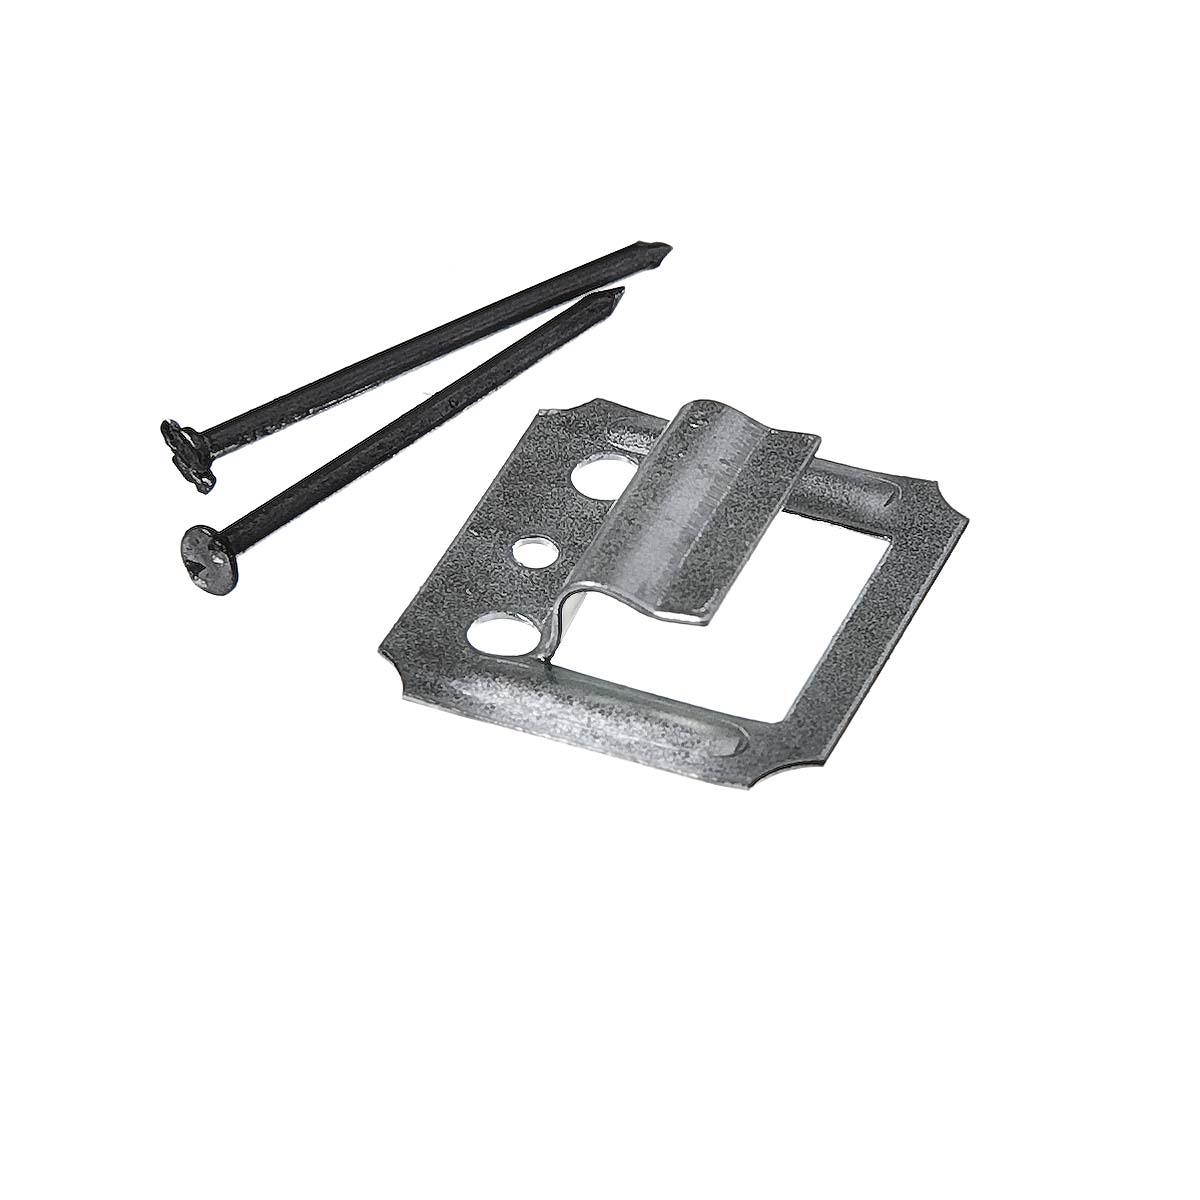 Крепеж (кляймер) №4 с гвоздями для вагонки и блок хауза (100 шт)